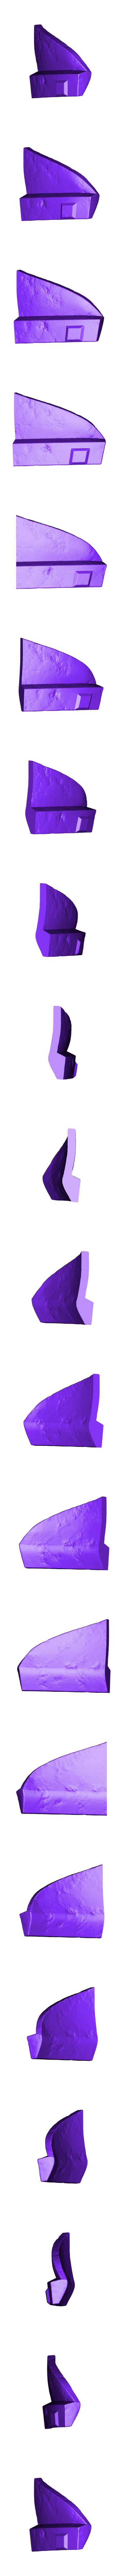 Armory_Damaged_Print22.stl Download OBJ file Armory - Knights of Ren Helmet (damaged), 3D print model • 3D print design, 3D-mon